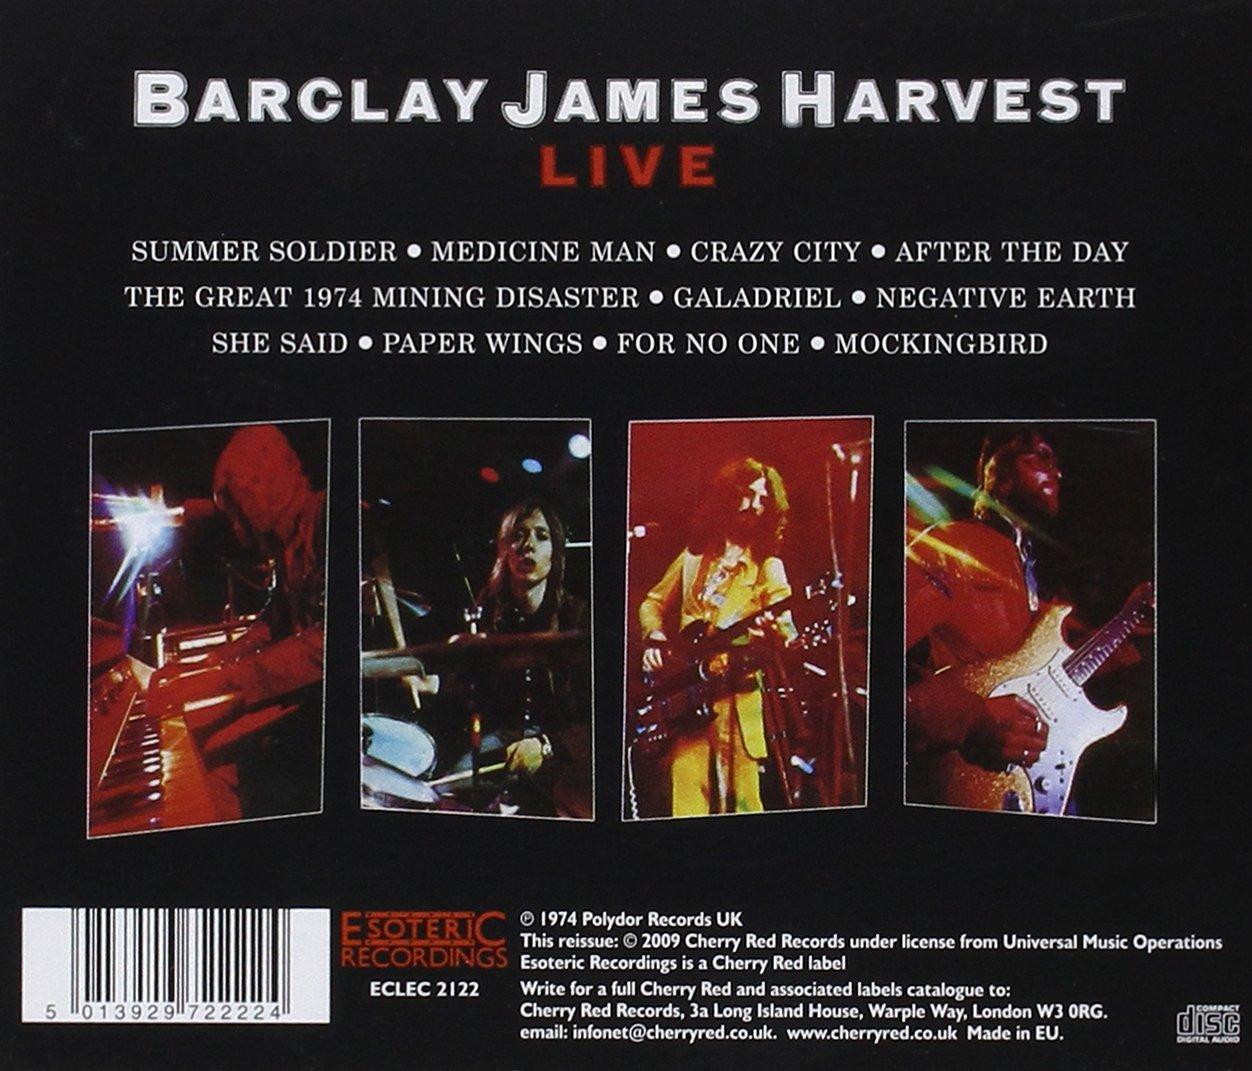 Live: BARCLAY JAMES HARVEST